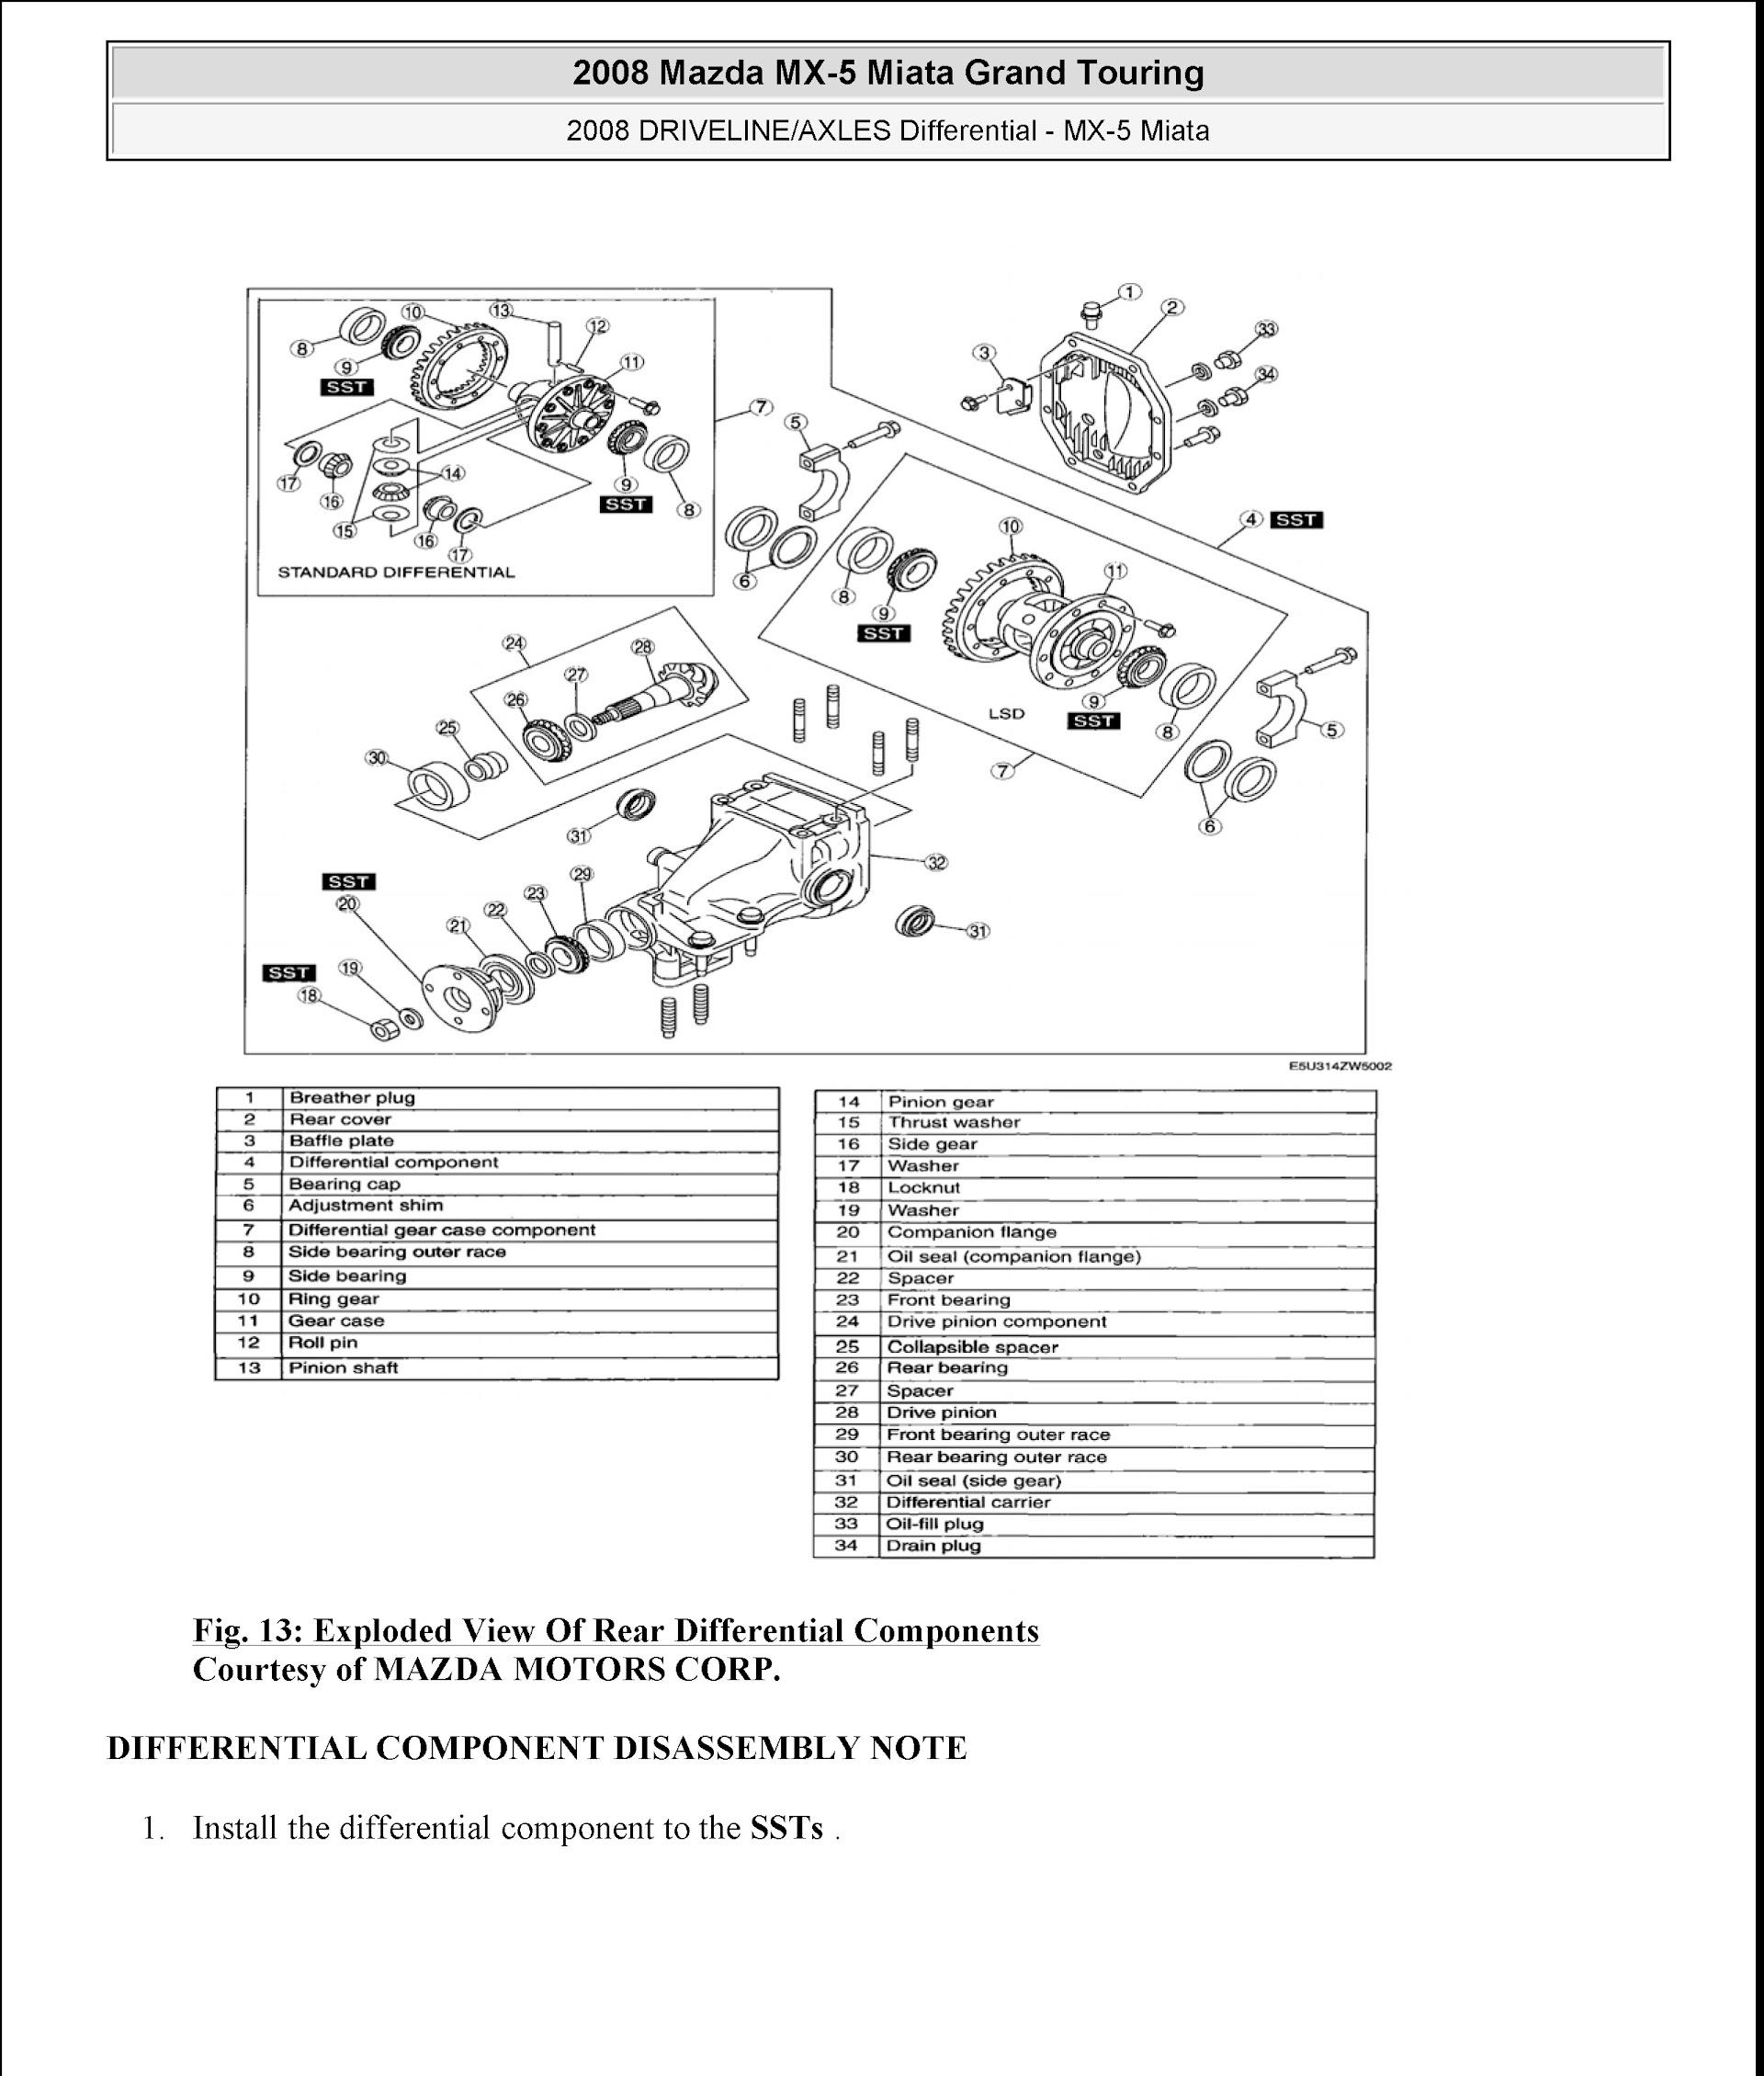 Download 2008-2009 Mazda Miata MX-5 Service Repair Manual